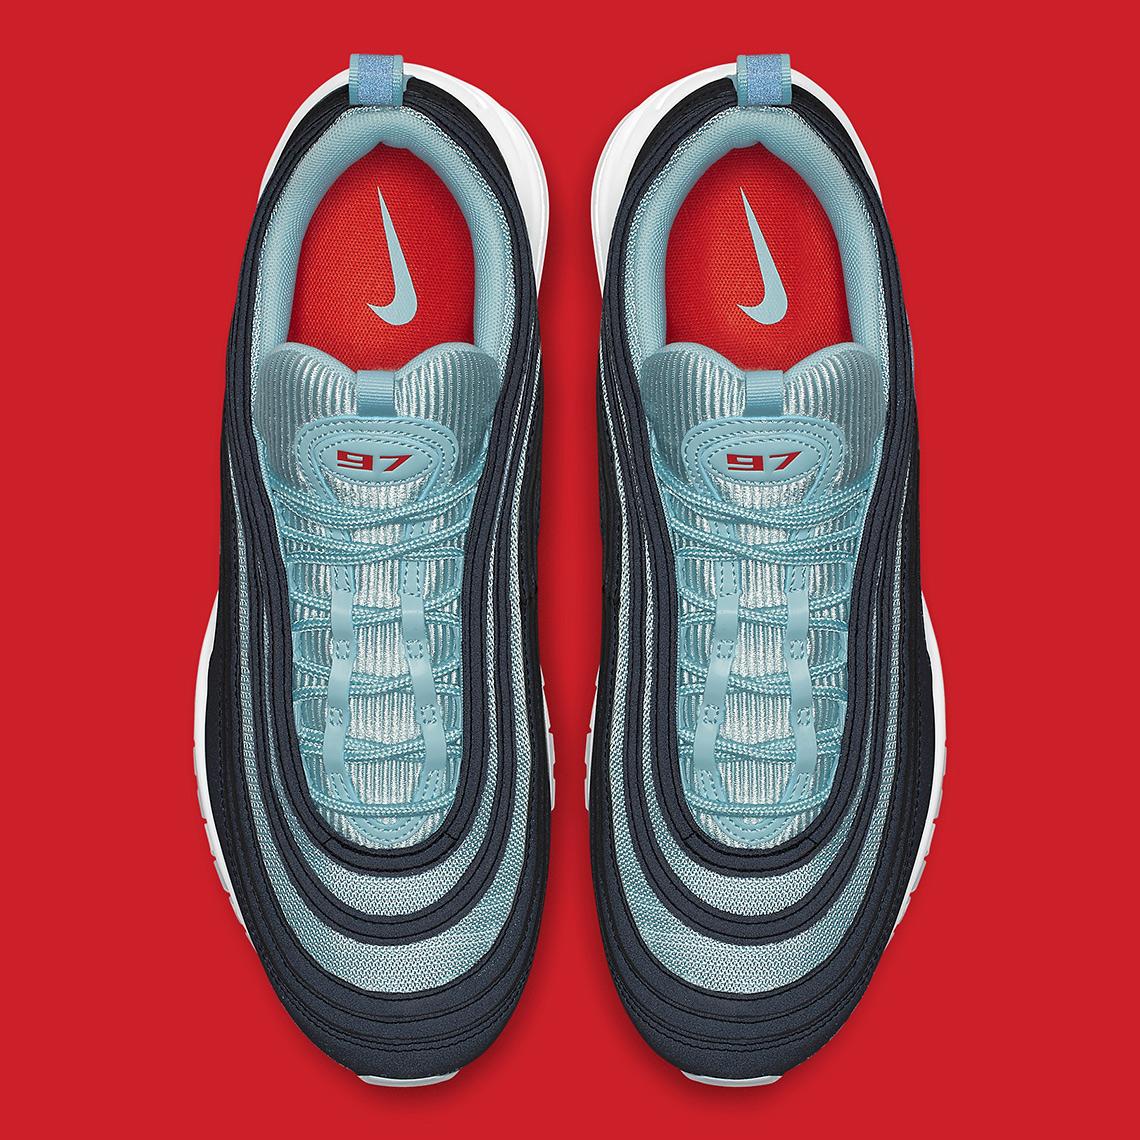 70e9d39bcb Nike Air Max 97 $160. Color: Dark Obsidian/Ocean Bliss-University Red Style  Code: AV7025-400. Advertisement. Advertisement